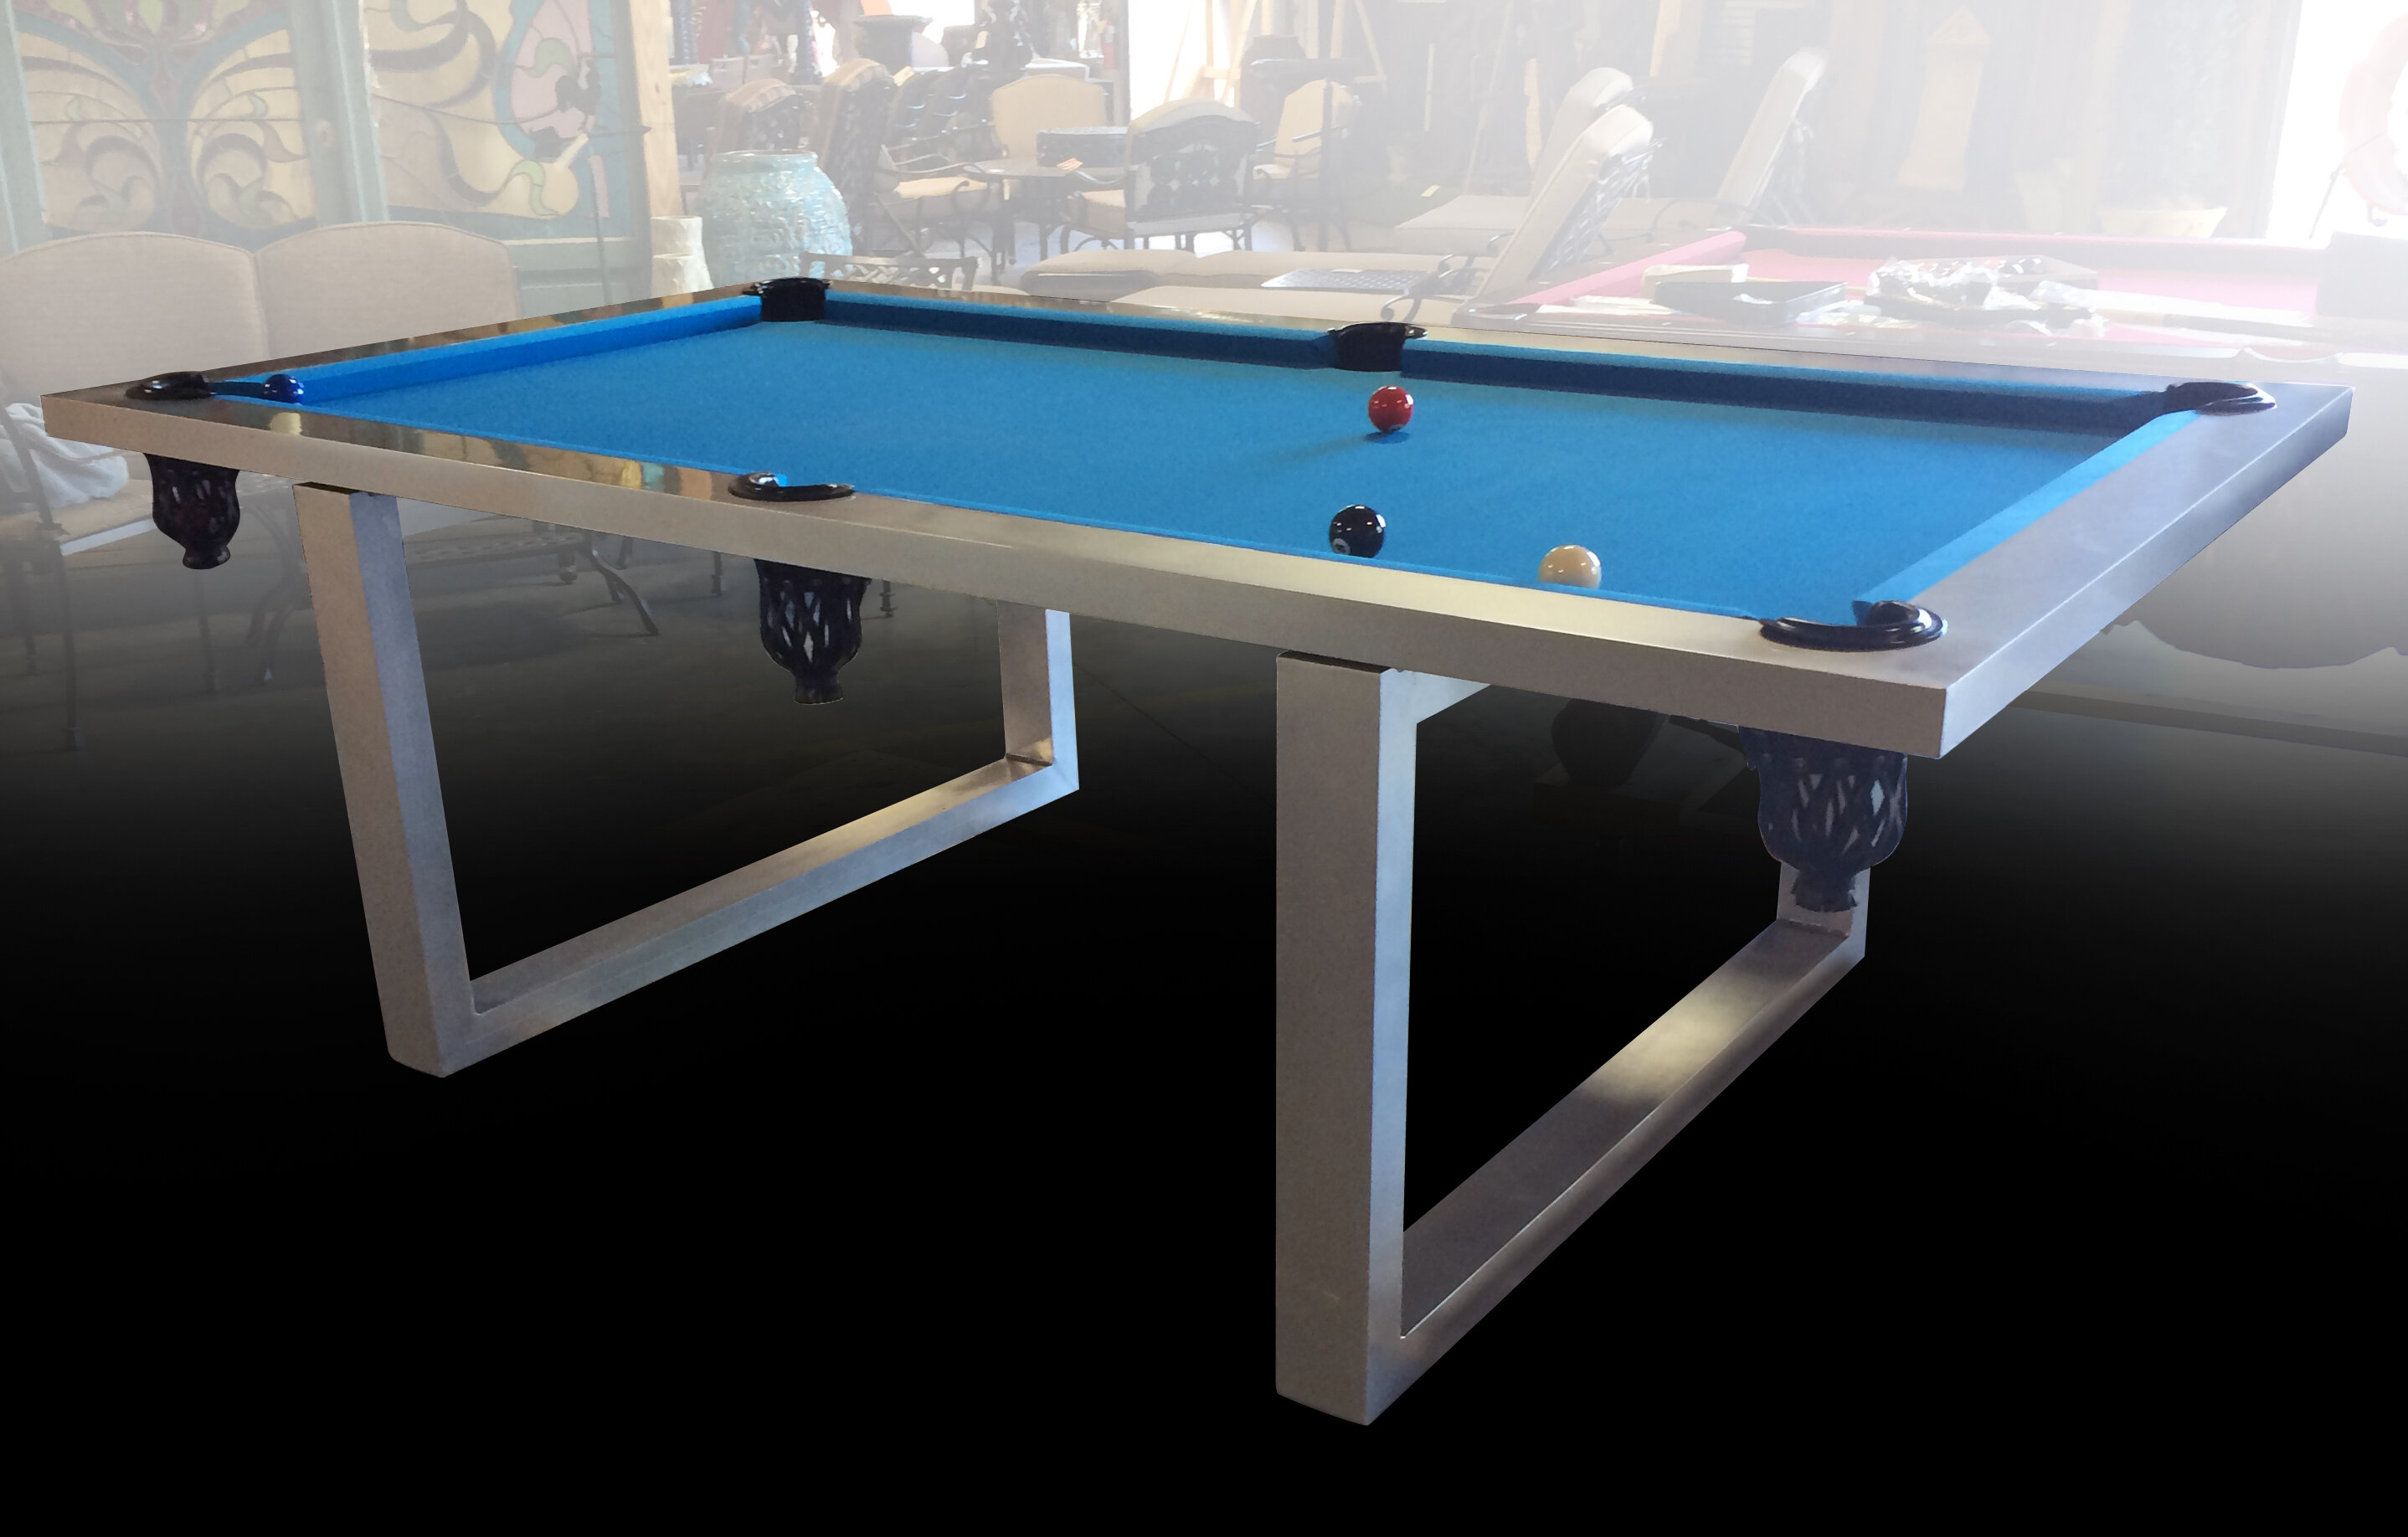 Art Frame Direct Stainless Steel 8' (Slate) Pool Table | Wayfair